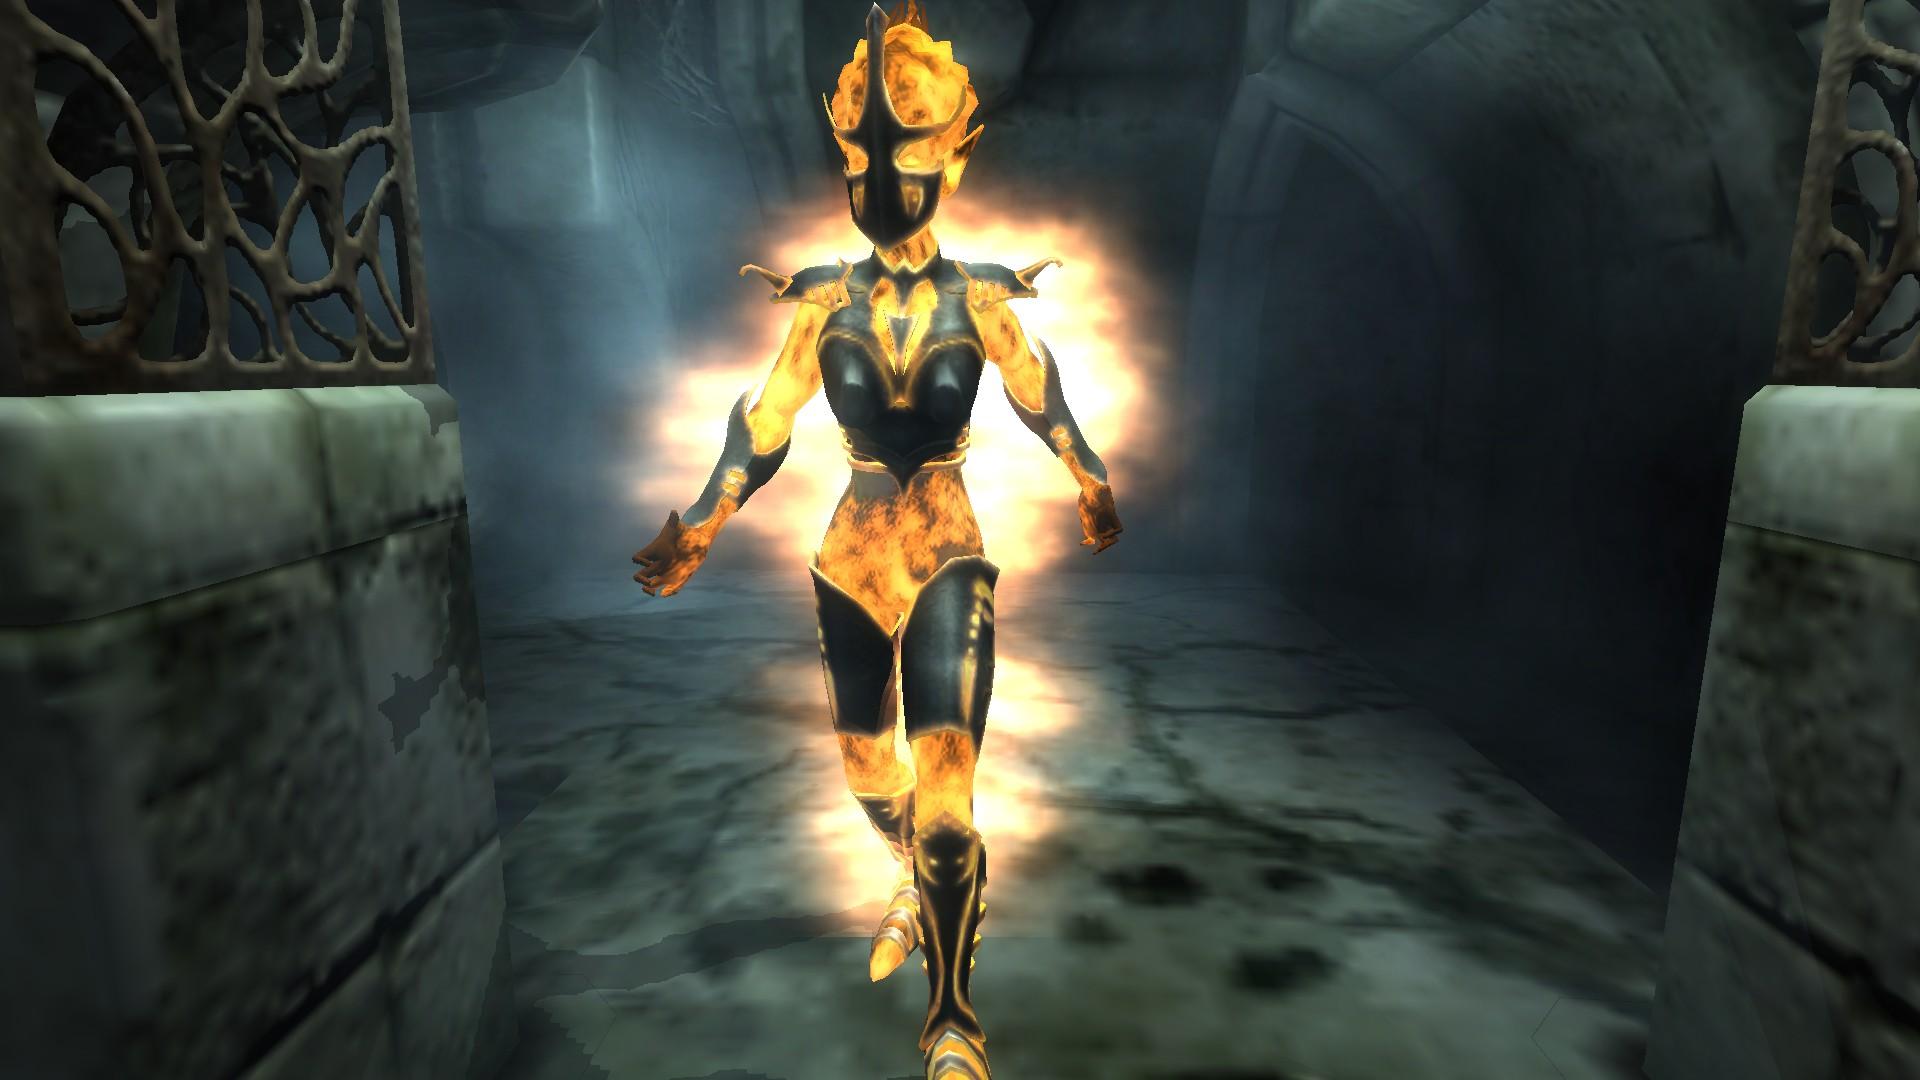 Flame Creature